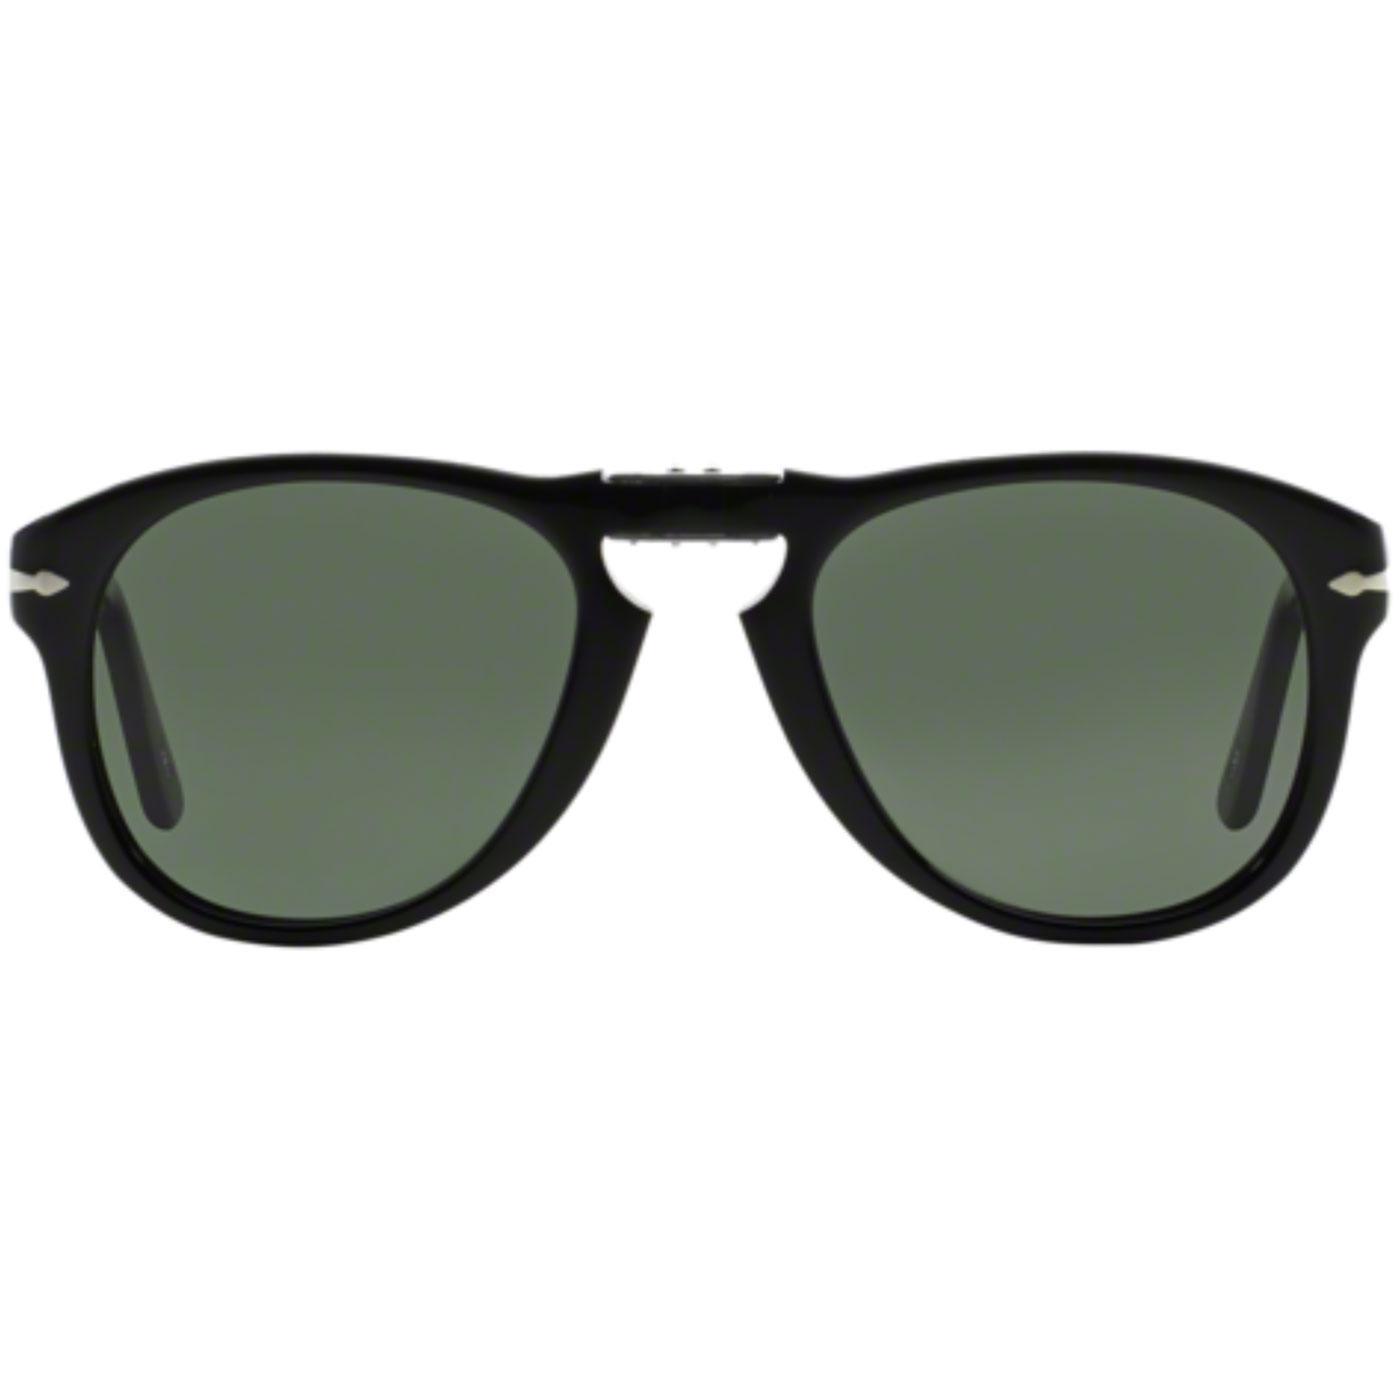 PERSOL Steve McQueen Folding 714 Series Sunglasses